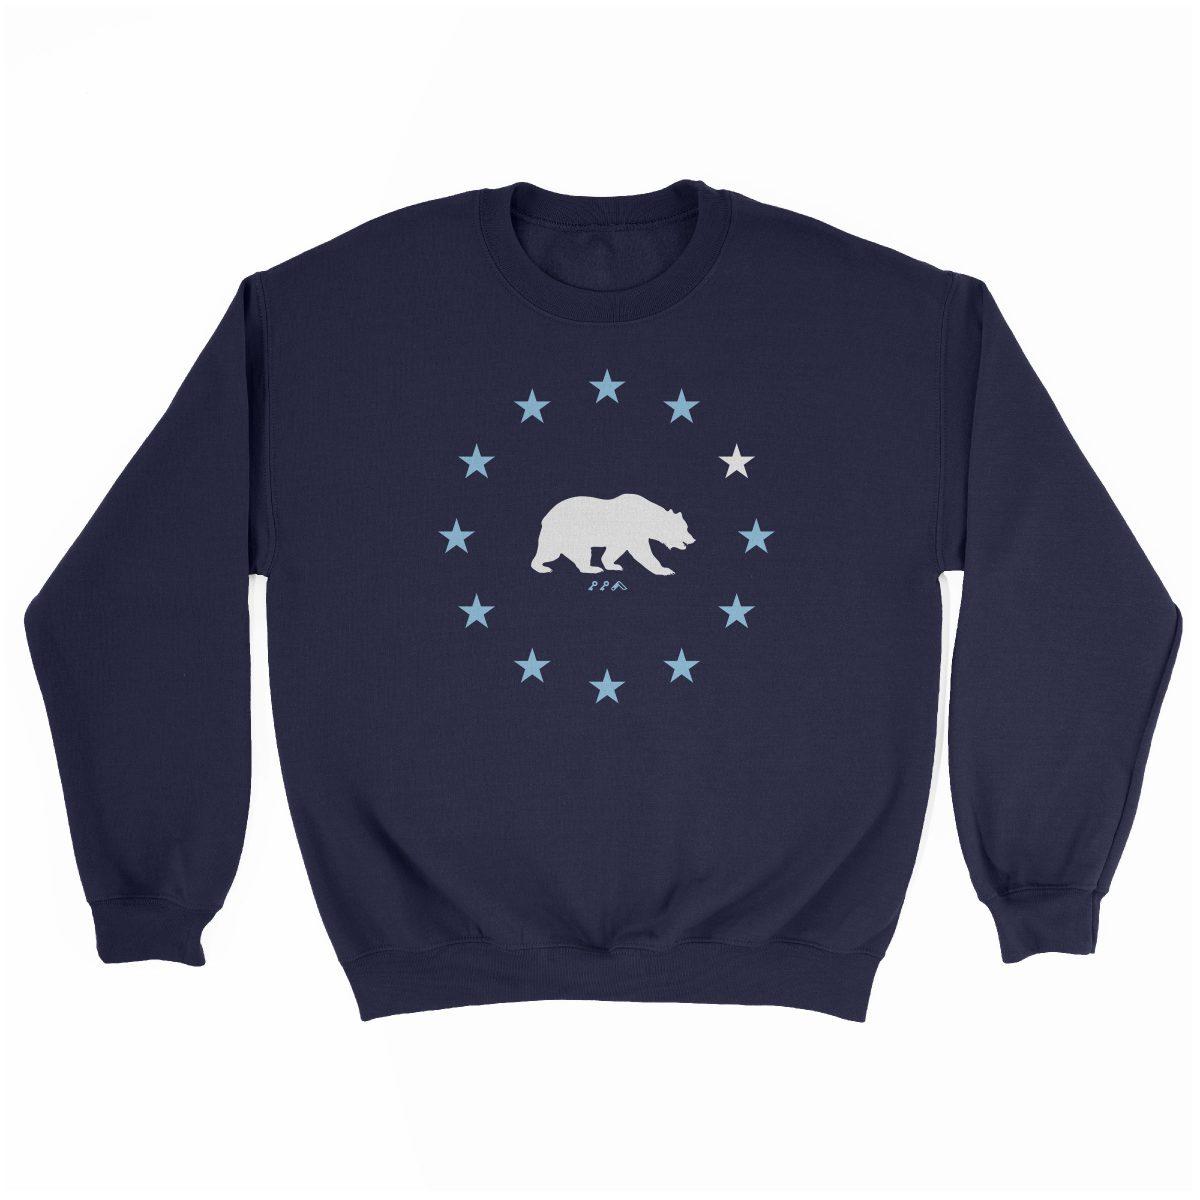 STAR GAZING cal bear california republic sweatshirt in navy at kikicutt.com